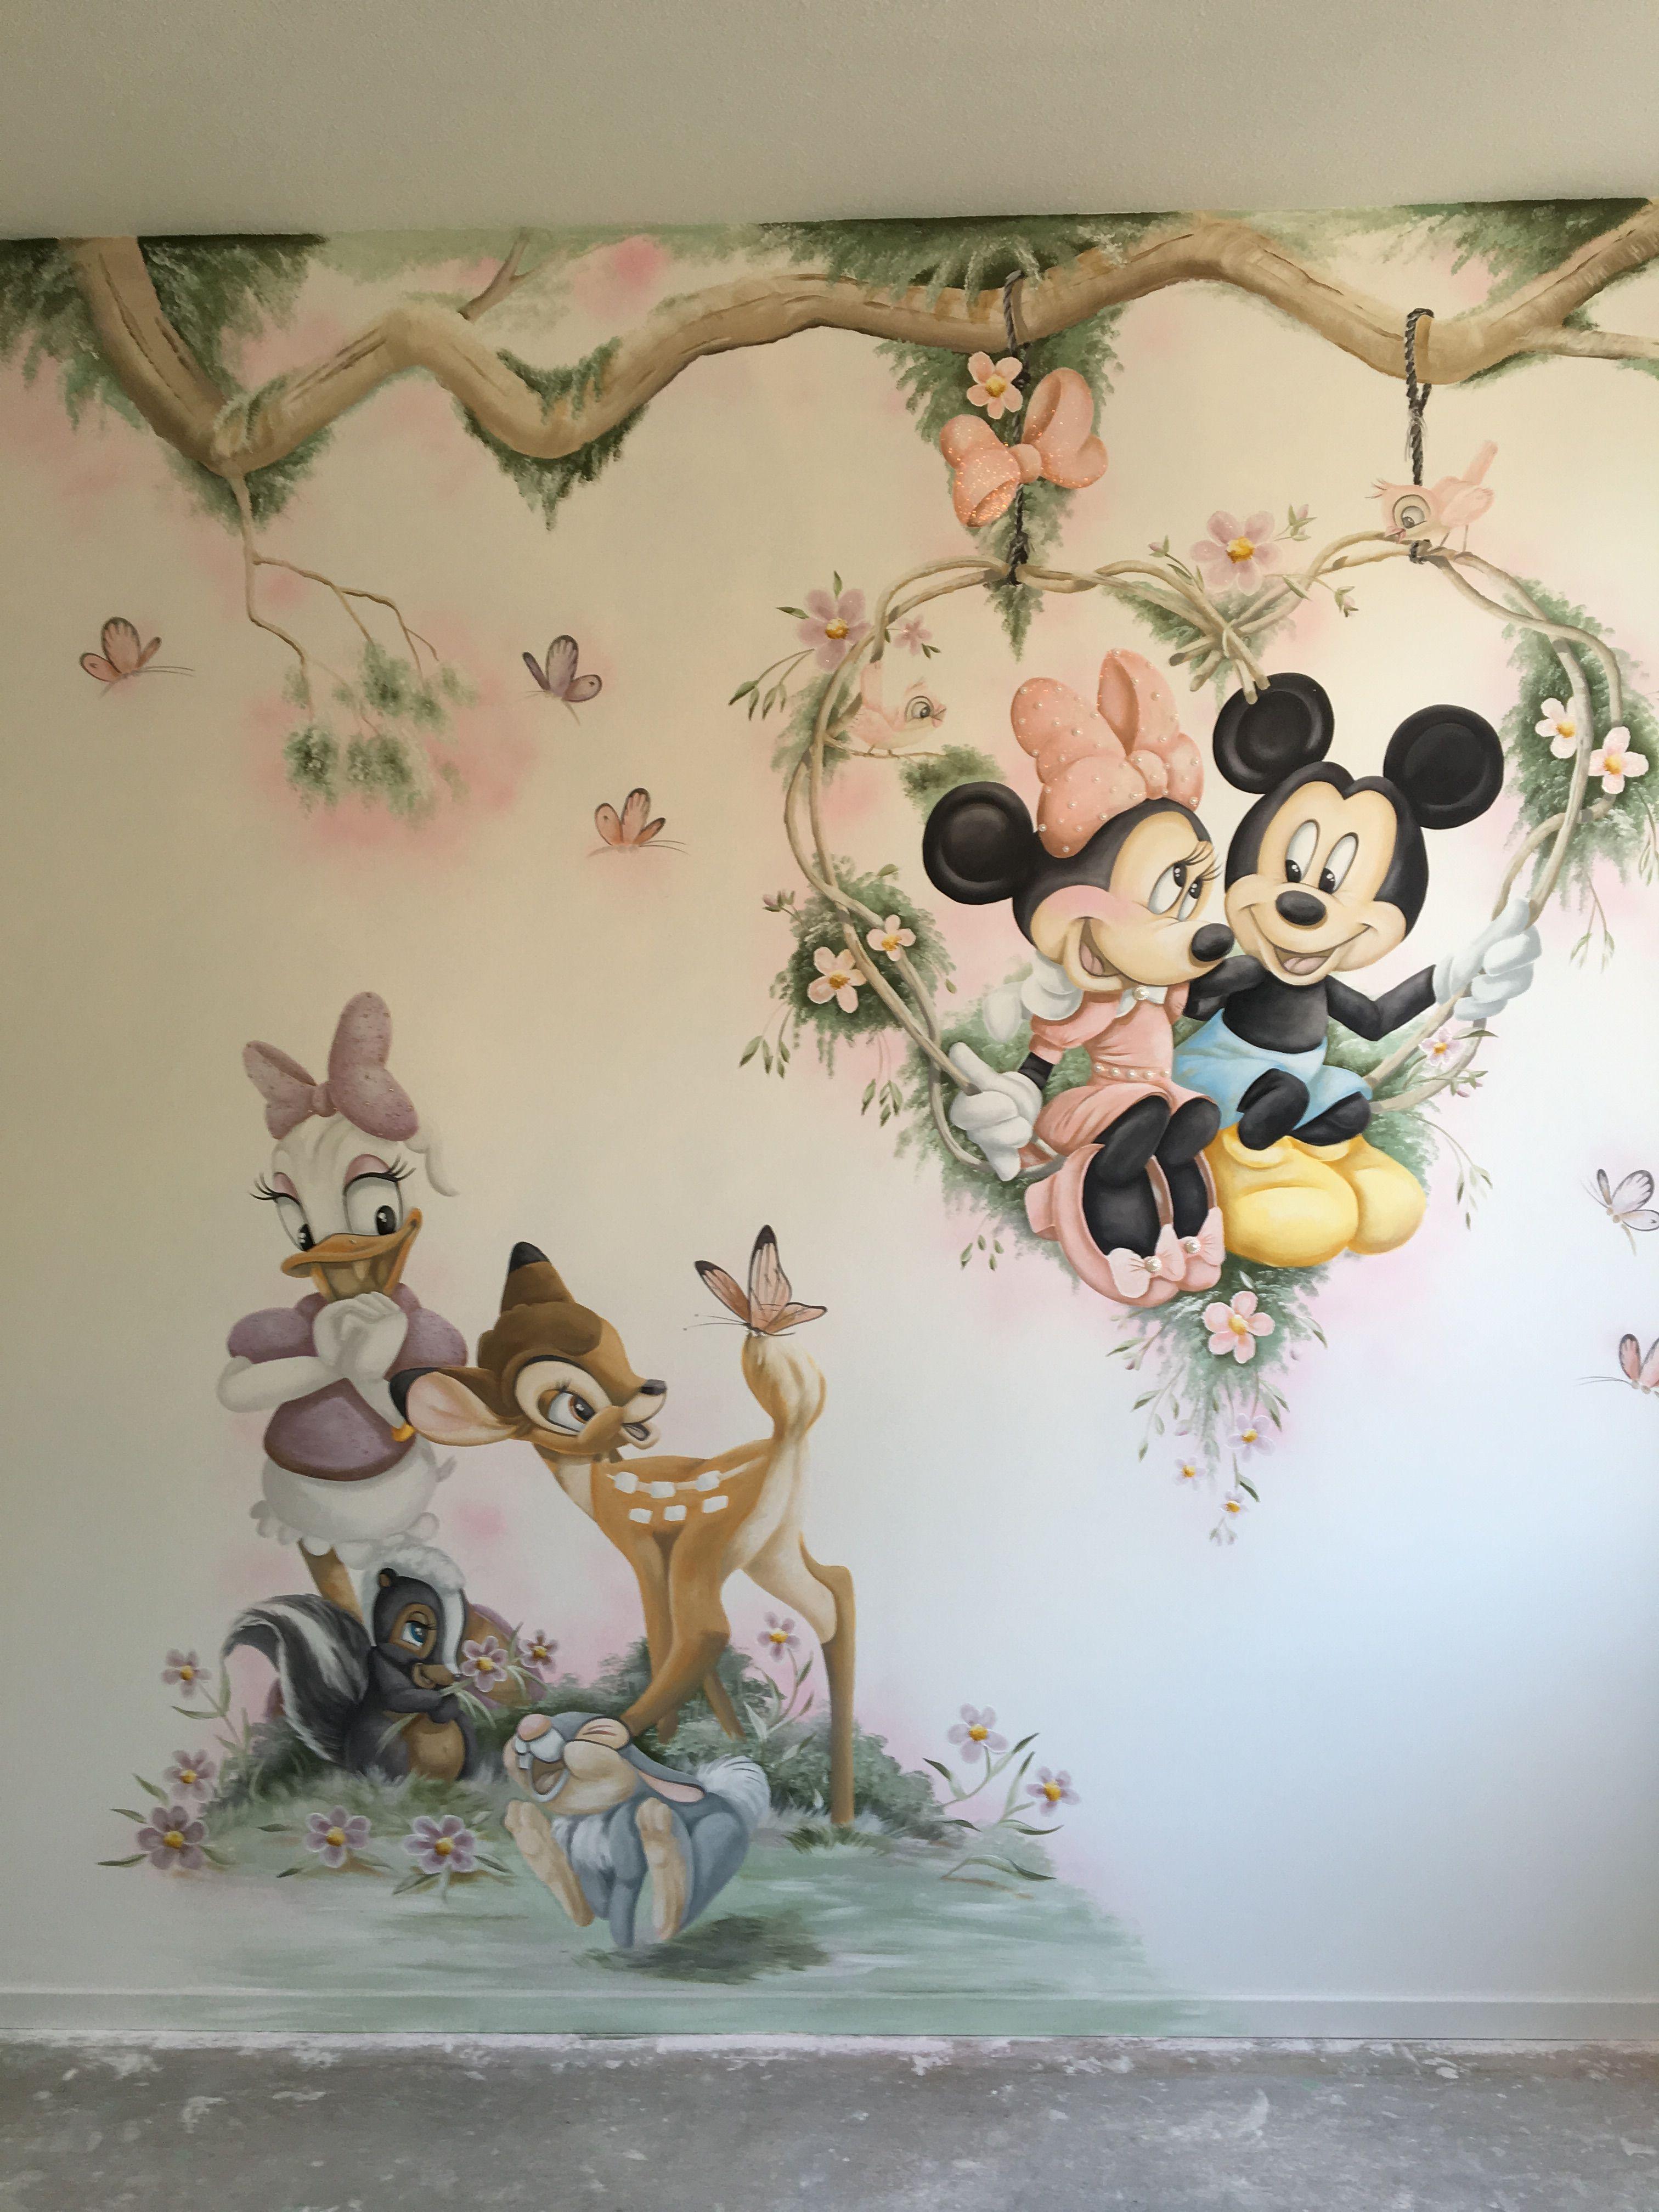 Kinder Wandtattoo Disney Mickey Mouse und Donald Duck